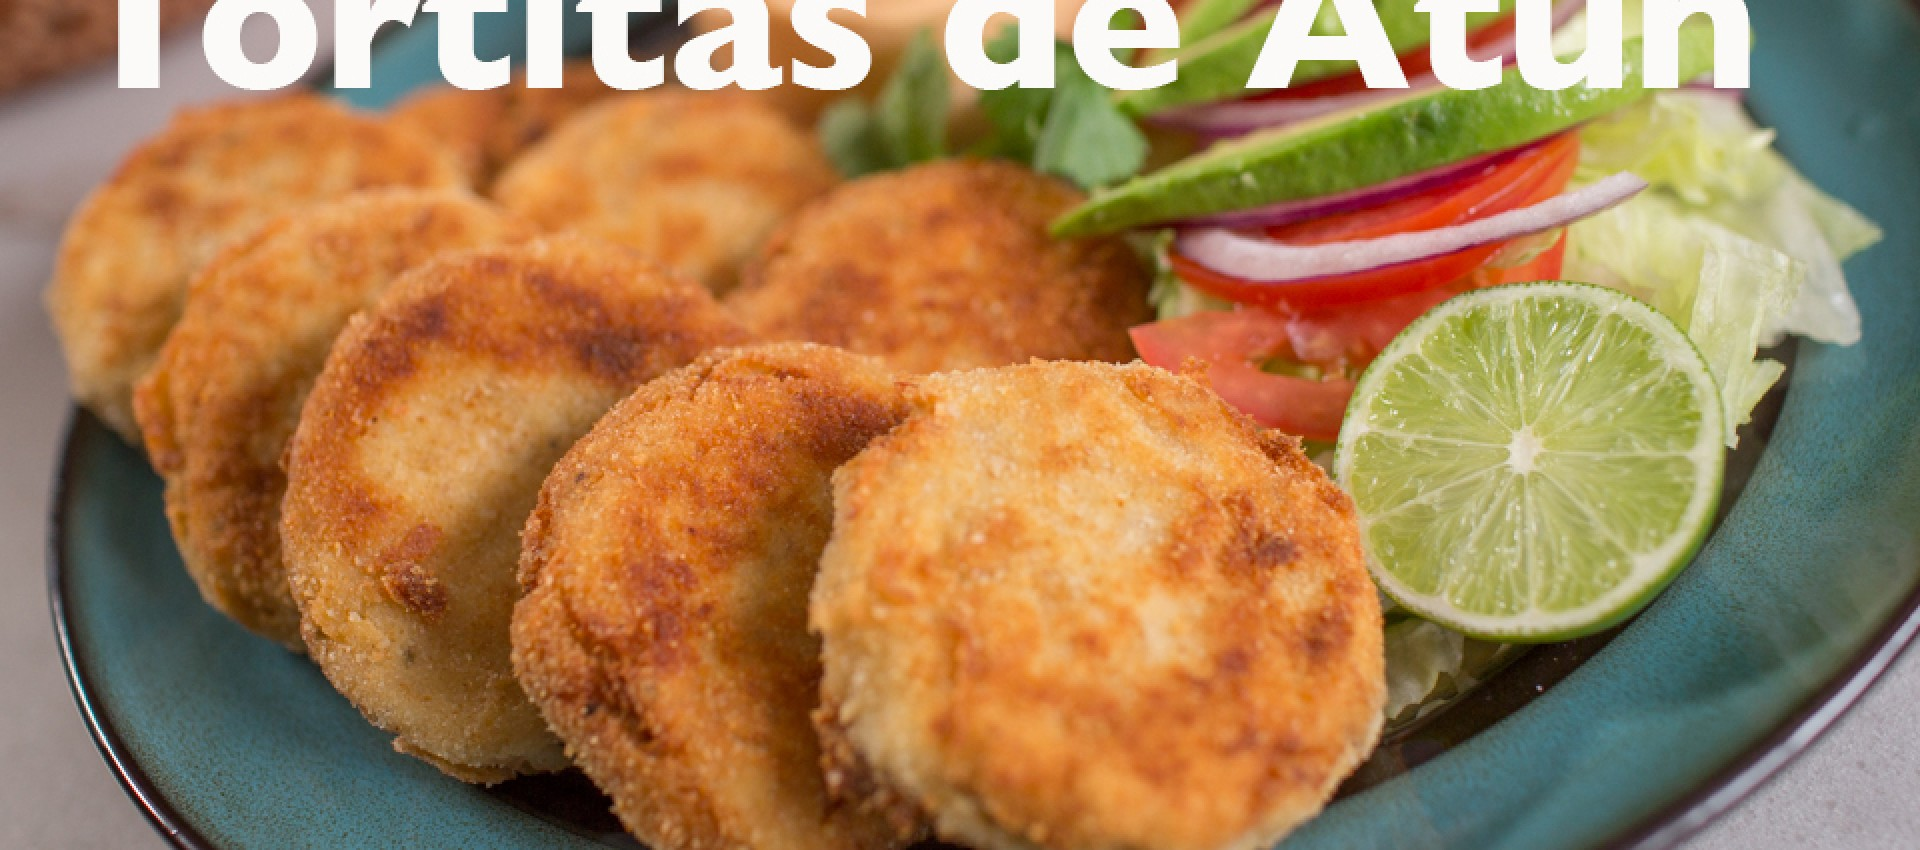 Tuna and Potato Patties Image